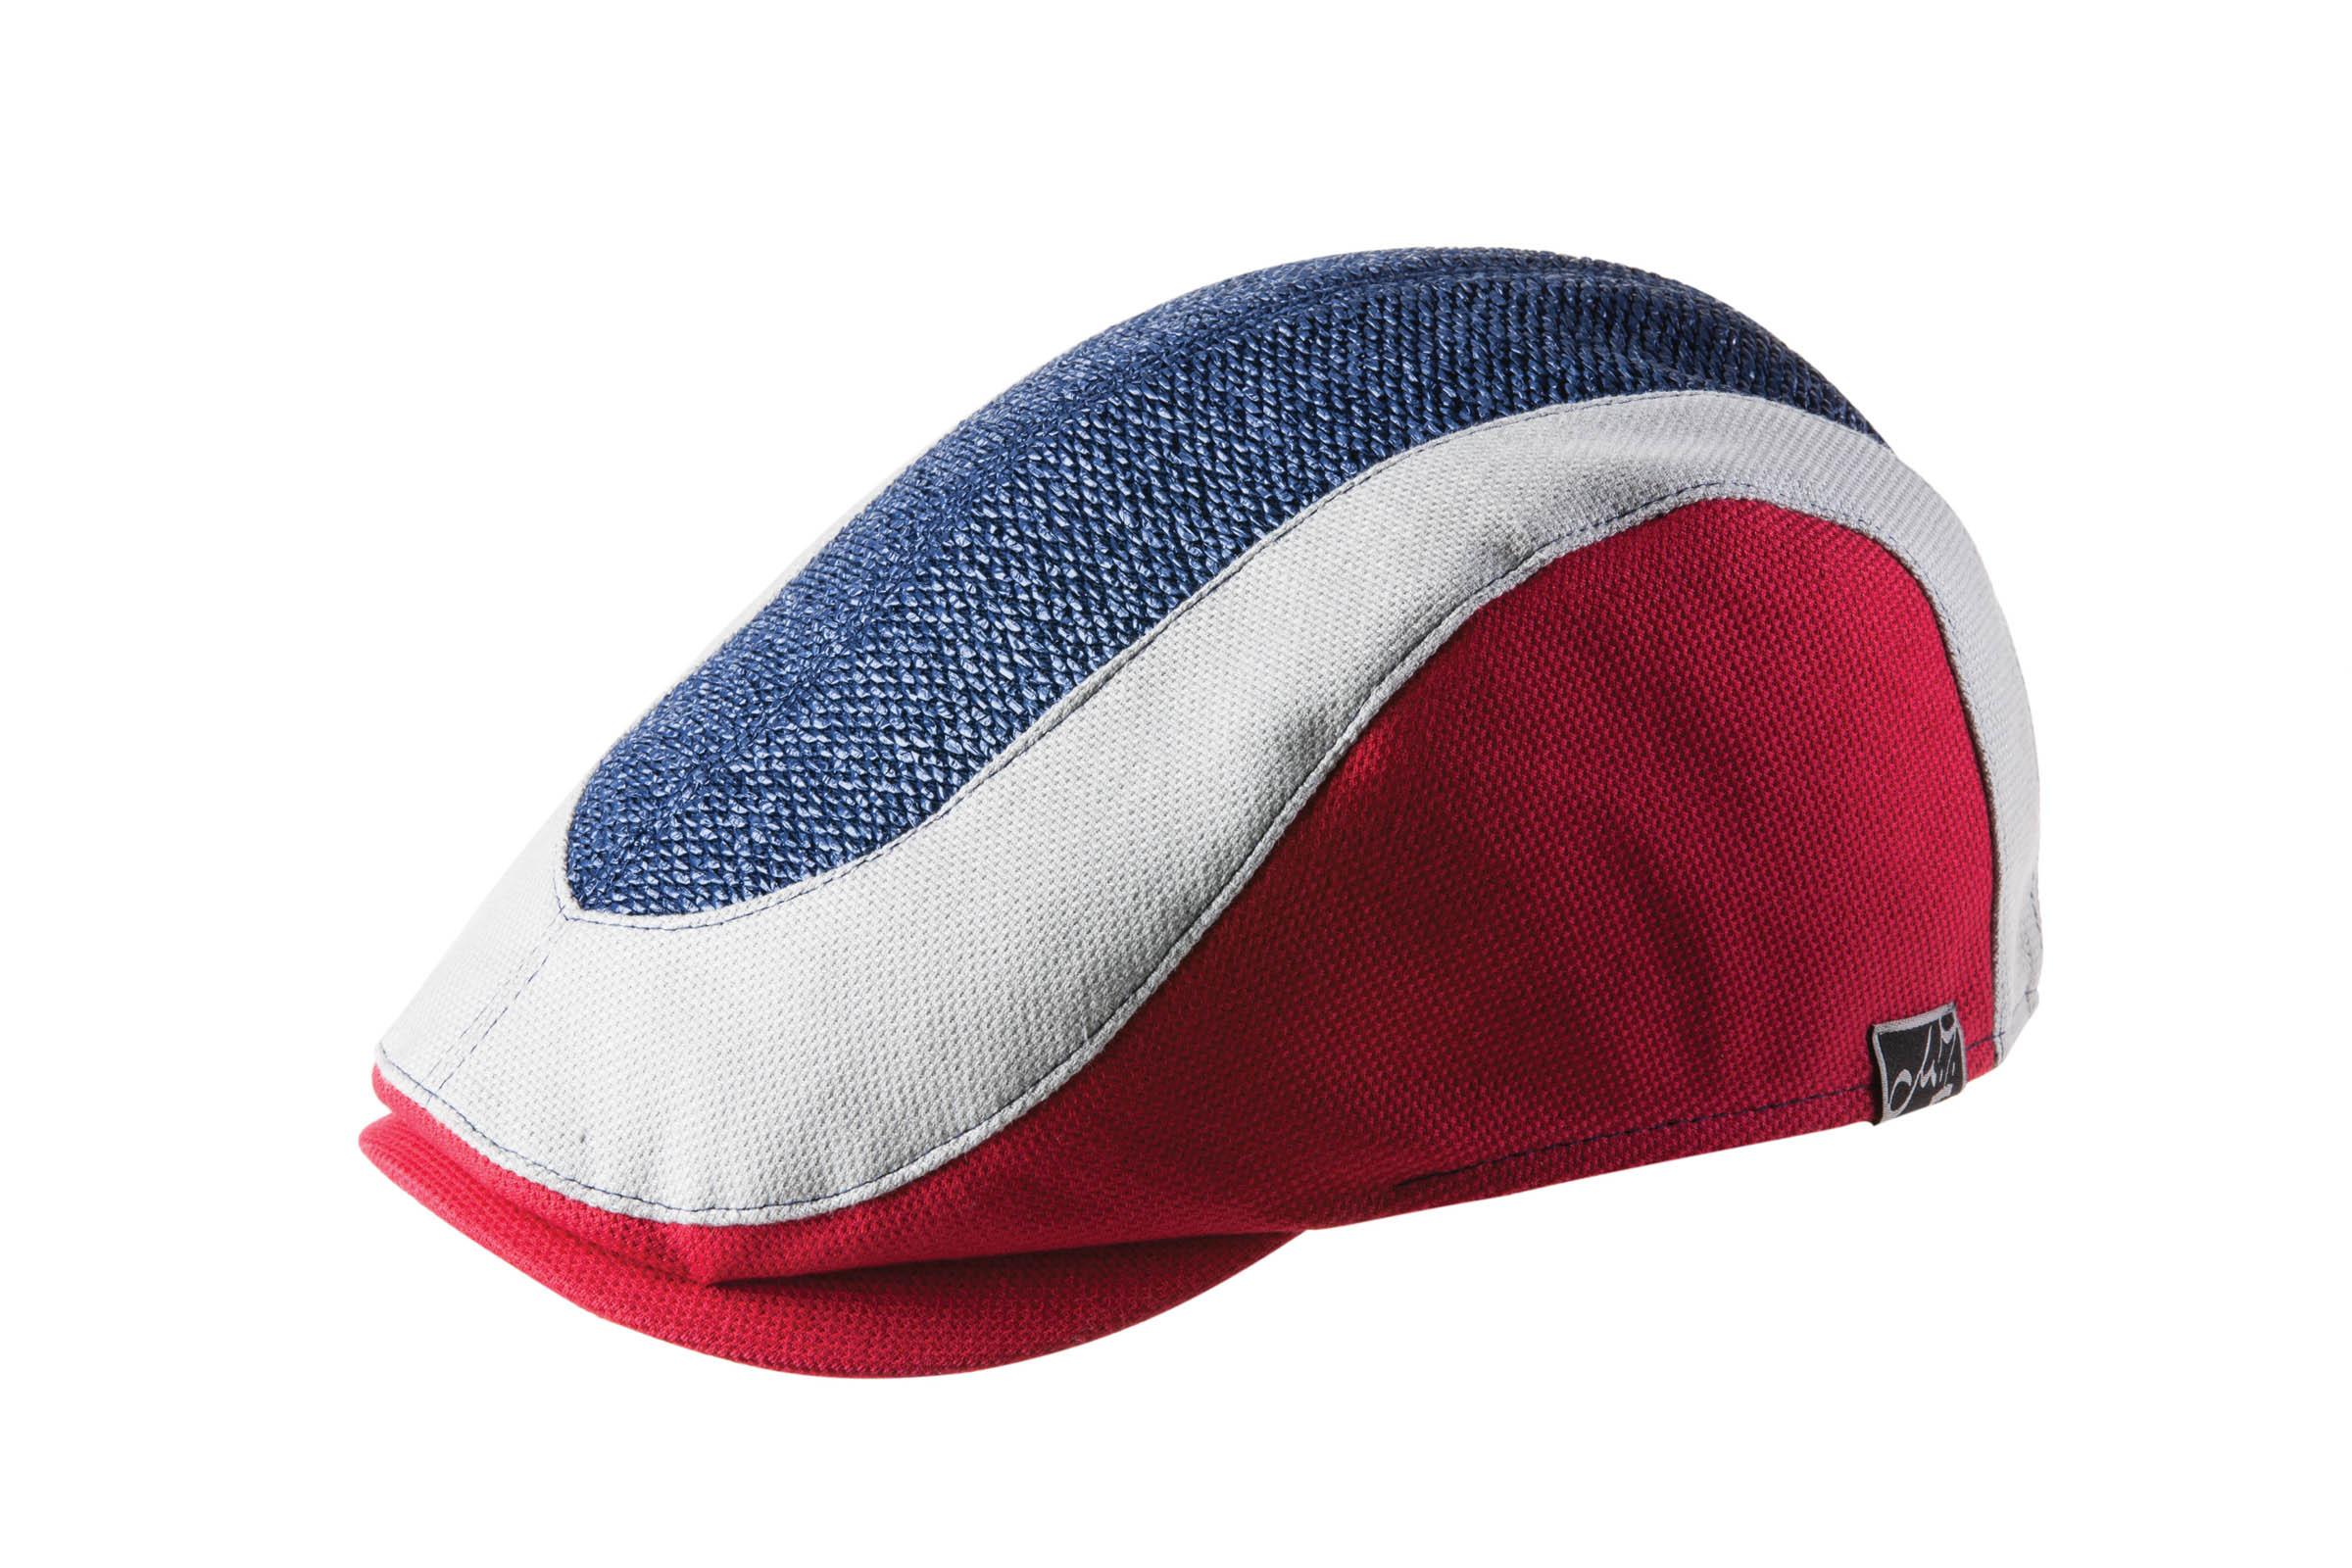 Mayser - MICHAEL ZECHBAUER - produktová fotografia klobúka 1